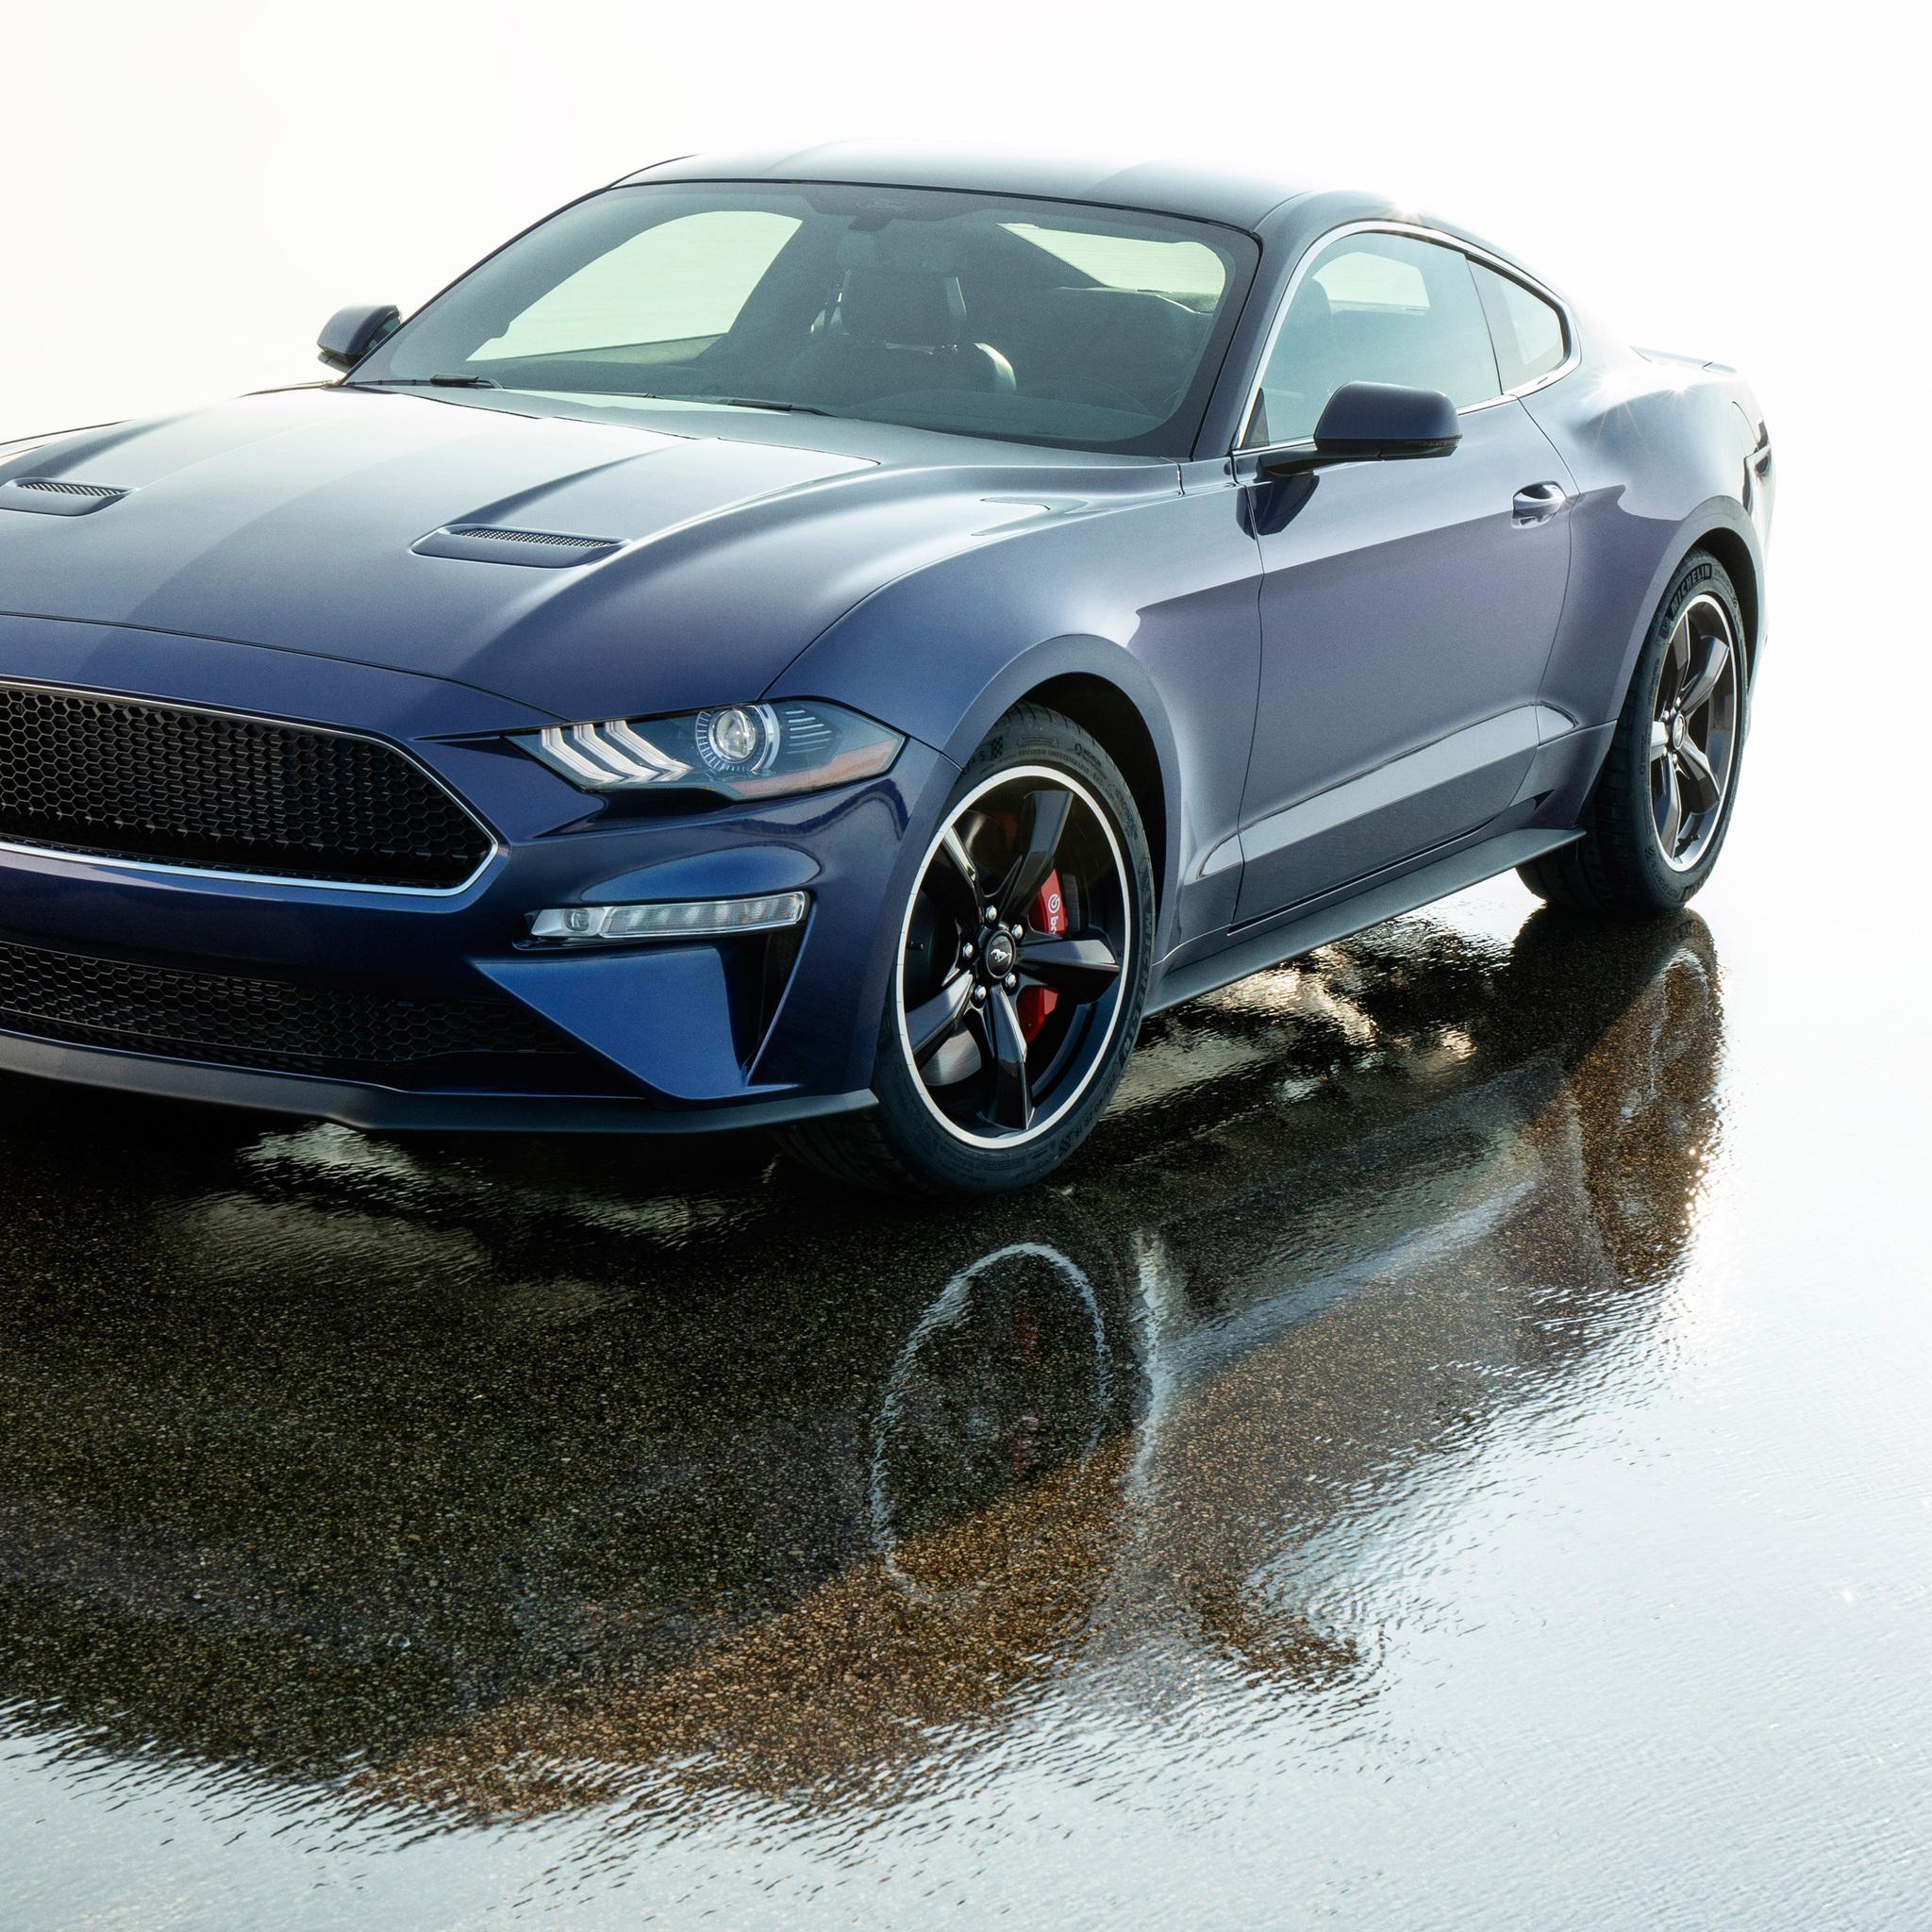 2048x2048 2019 Ford Mustang Bullitt Kona Blue Ipad Air HD